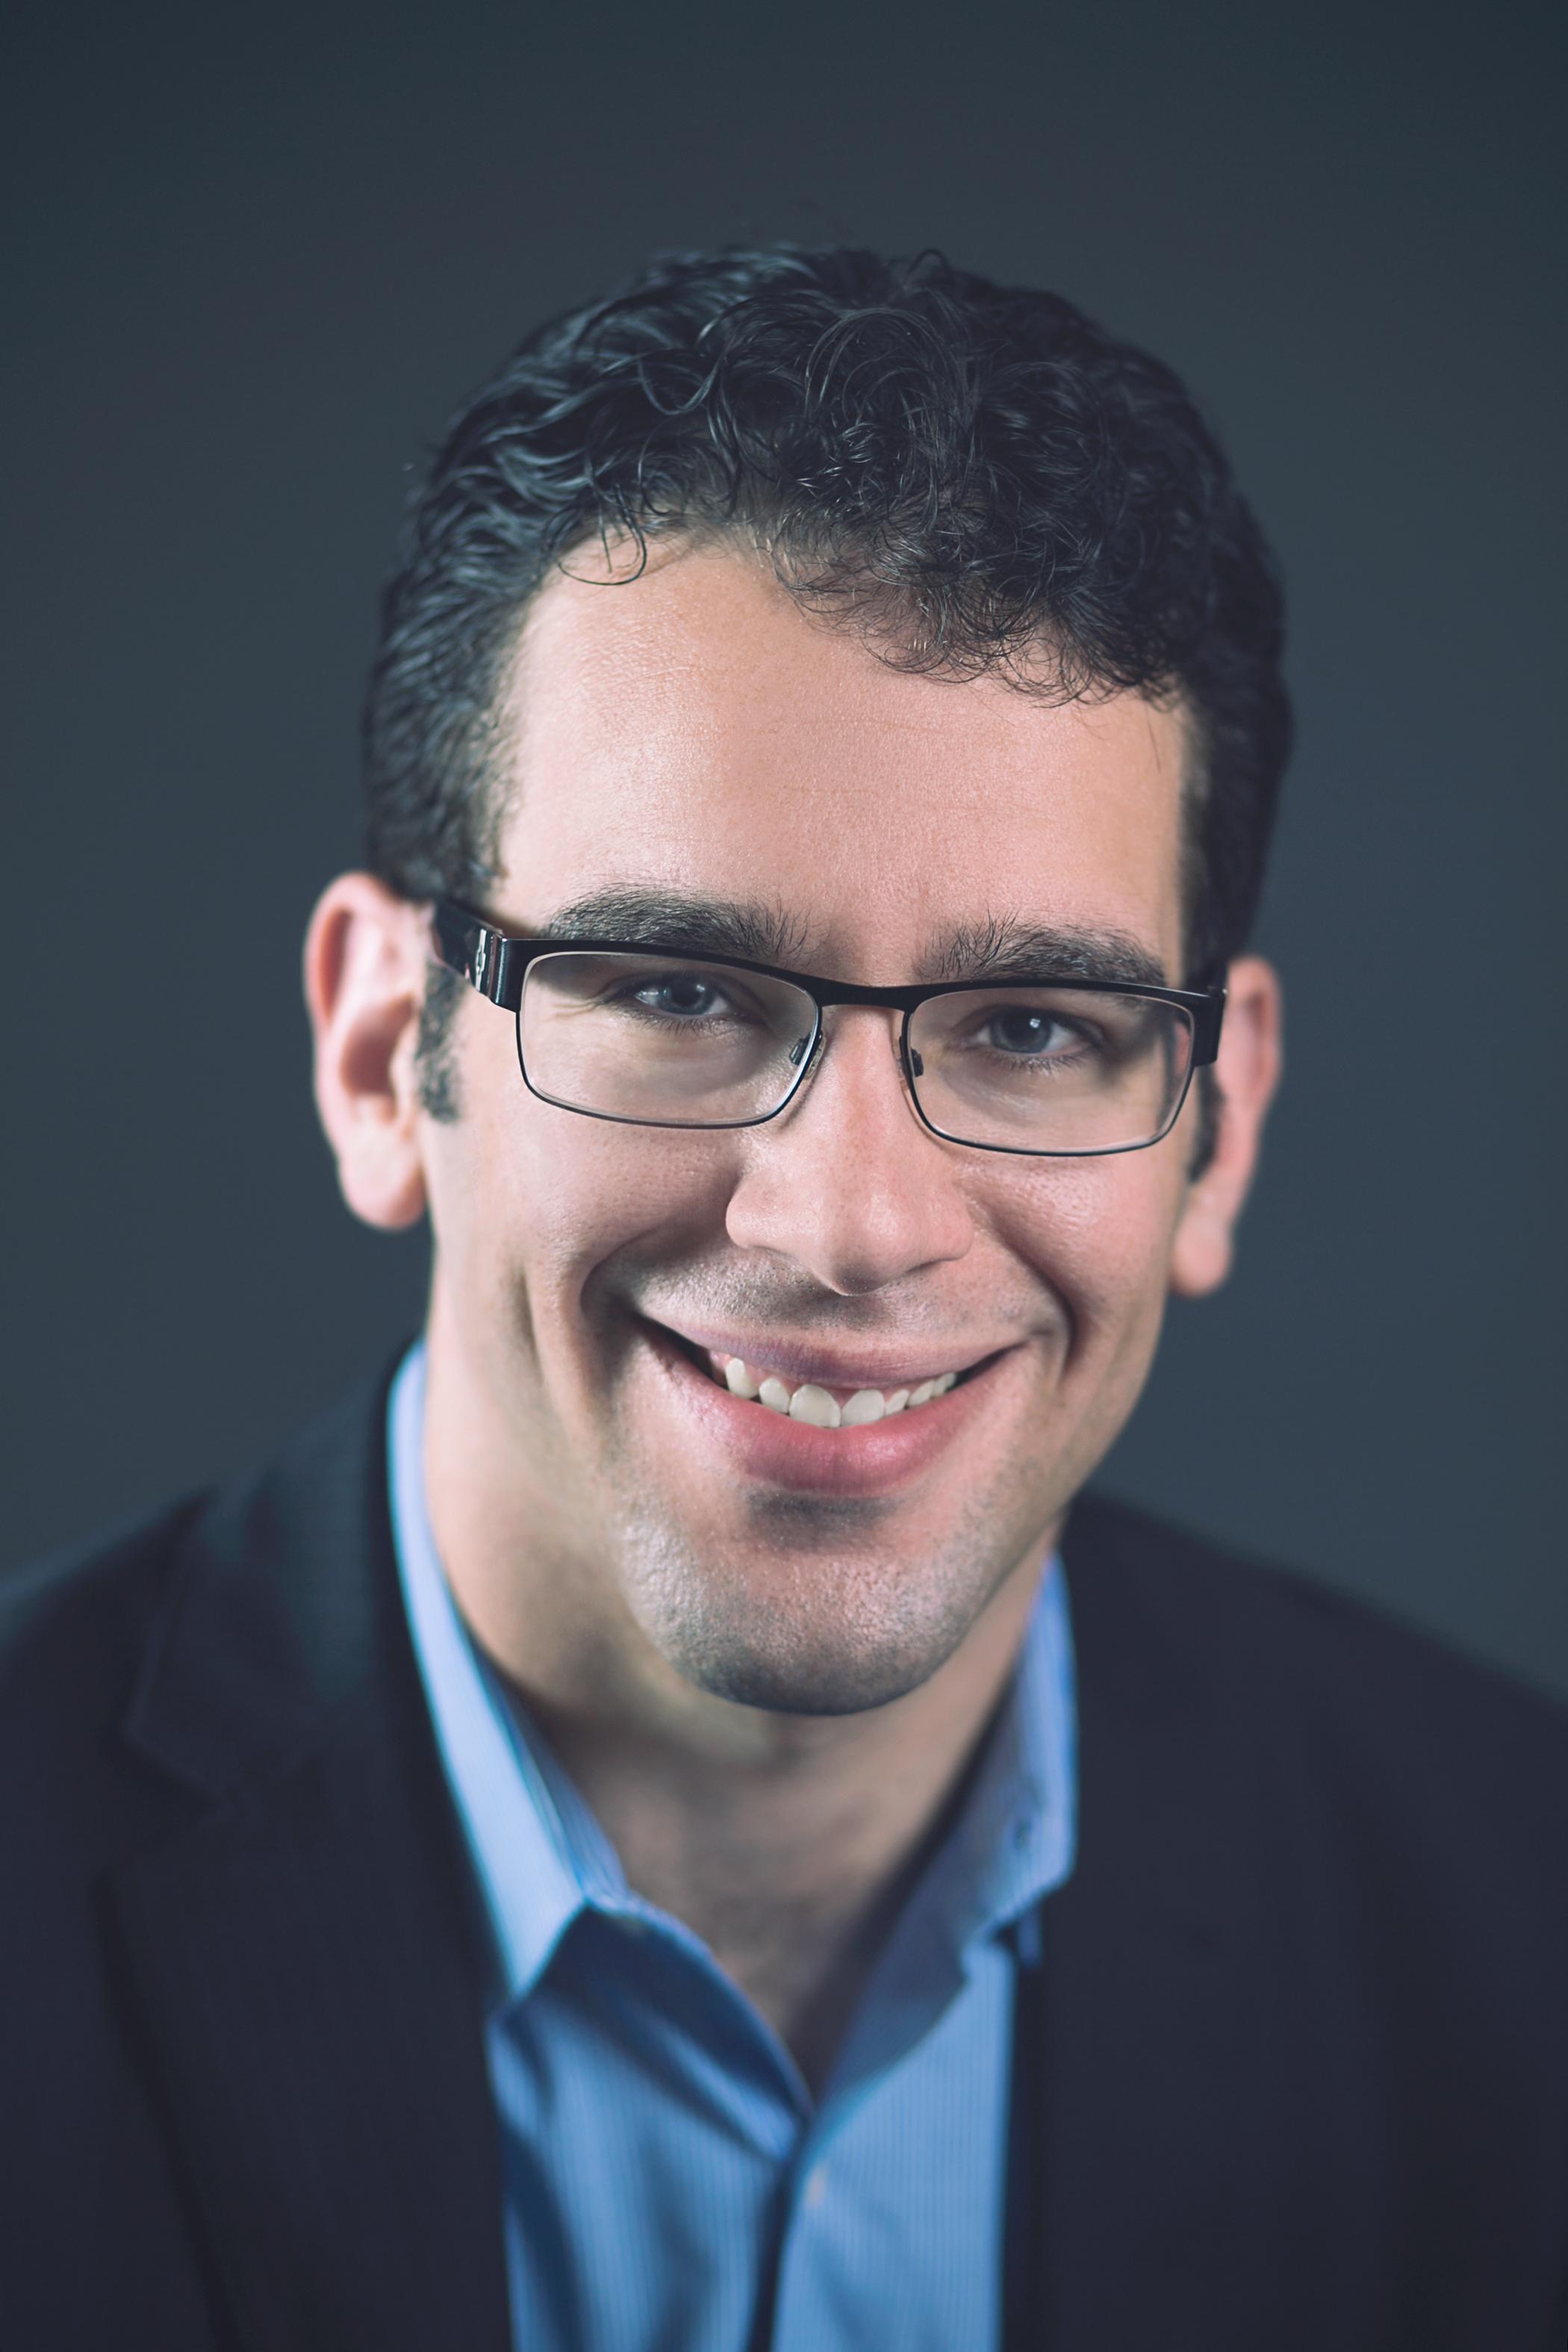 Michael Schlossberg